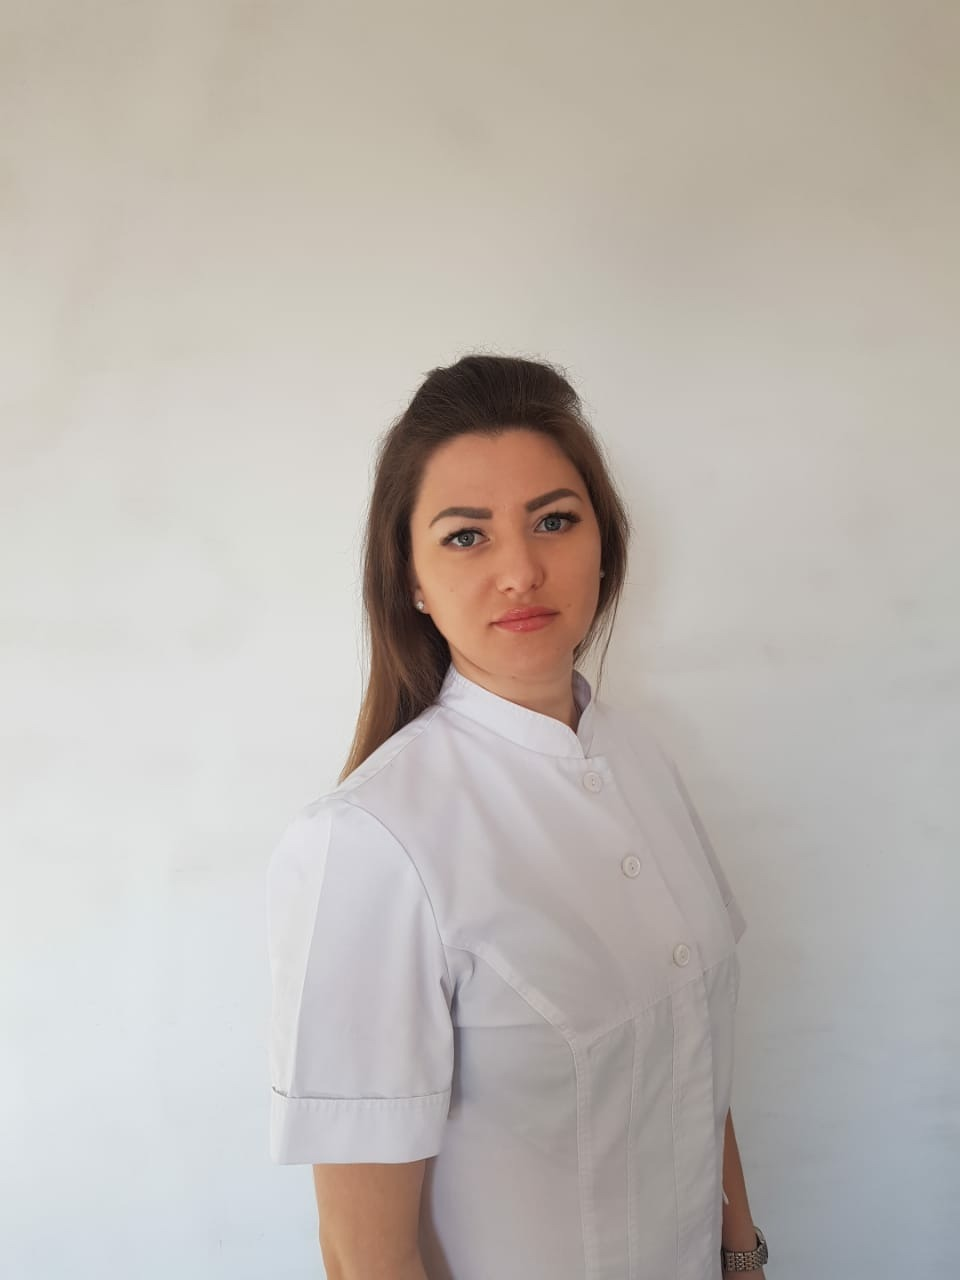 Нестерова Дарья Викторовна